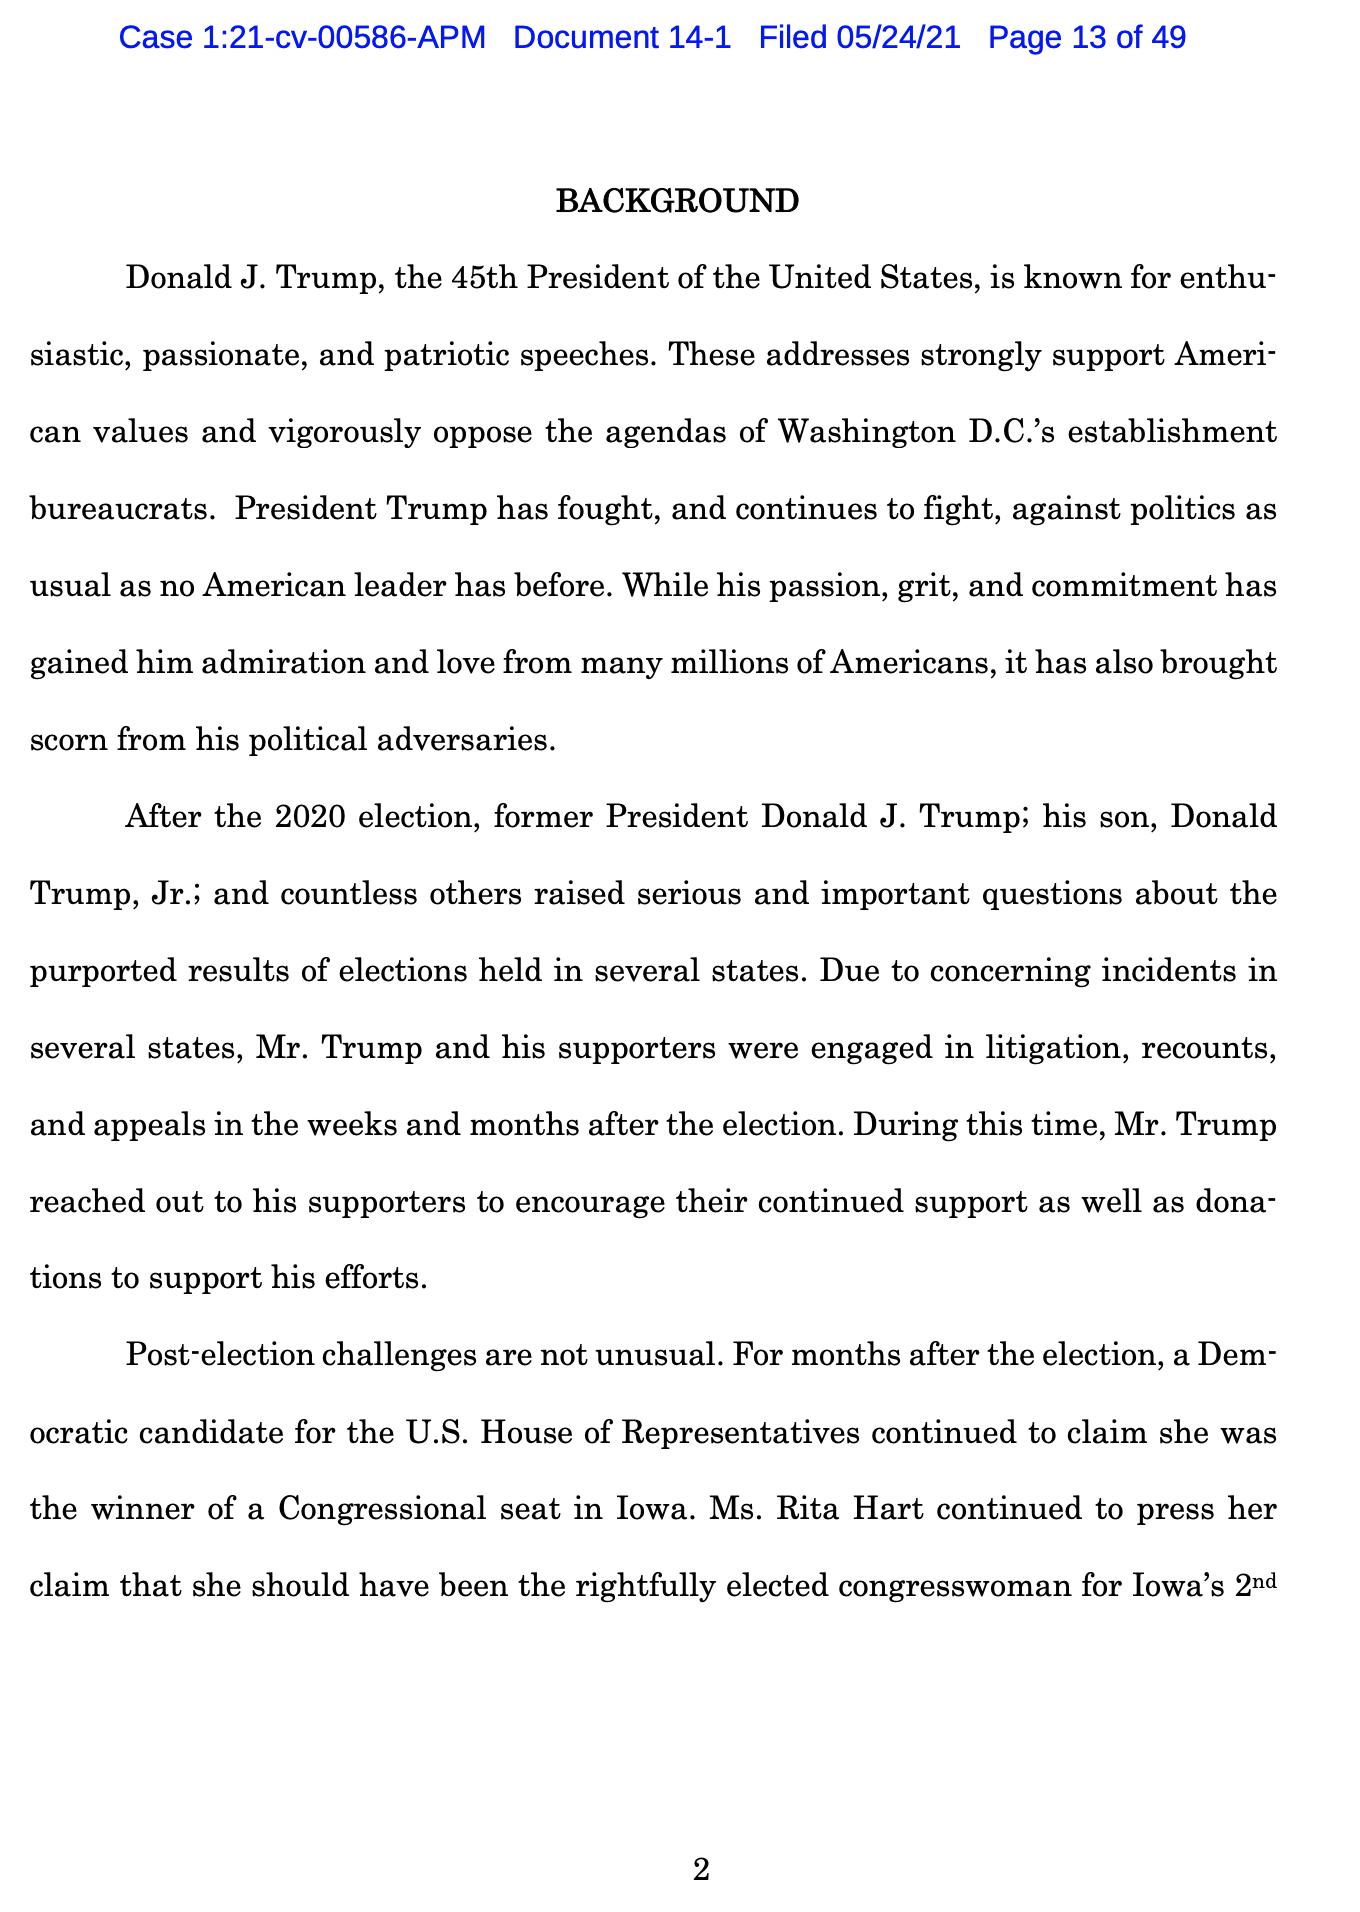 Screen-Shot-2021-05-25-at-9.49.02-AM Trump Declares Full Immunity From Jan. 6 Insurrection Lawsuit Crime Donald Trump Featured Politics Top Stories